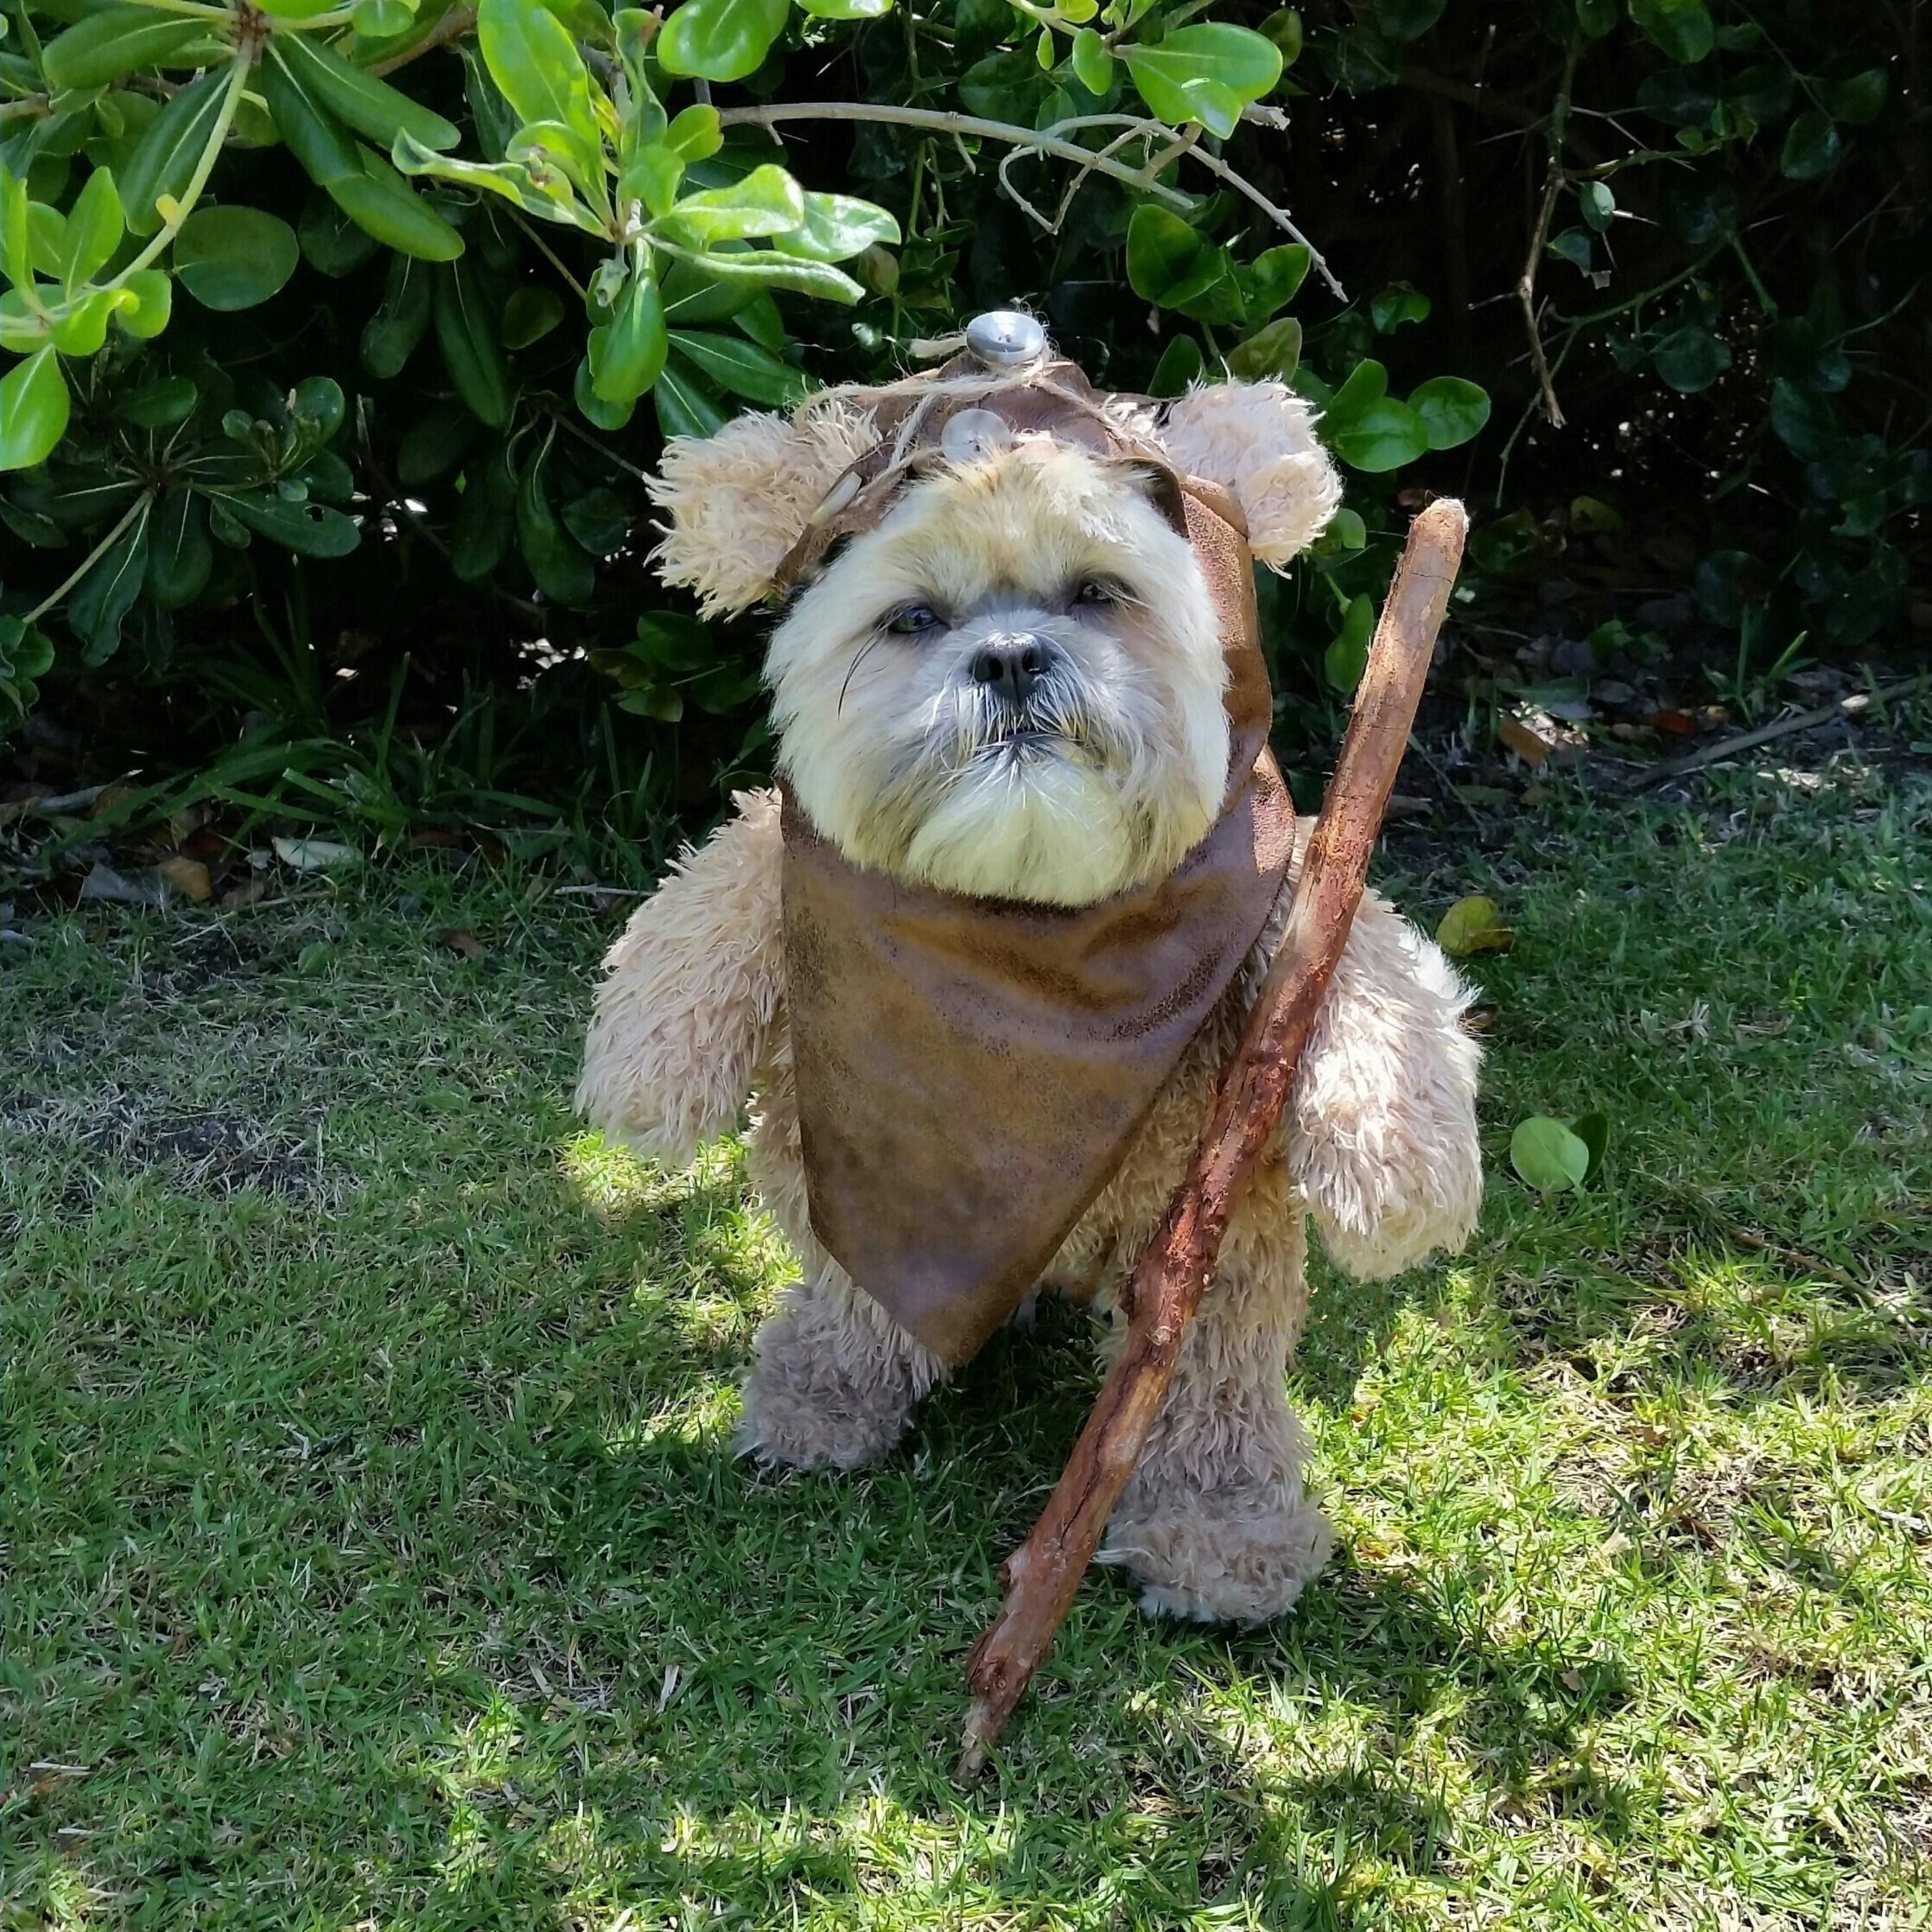 Dog Munchkin Dressed as an Ewok; munchkintheteddybear (You Tube);@munchkintheteddybear (Instagram)